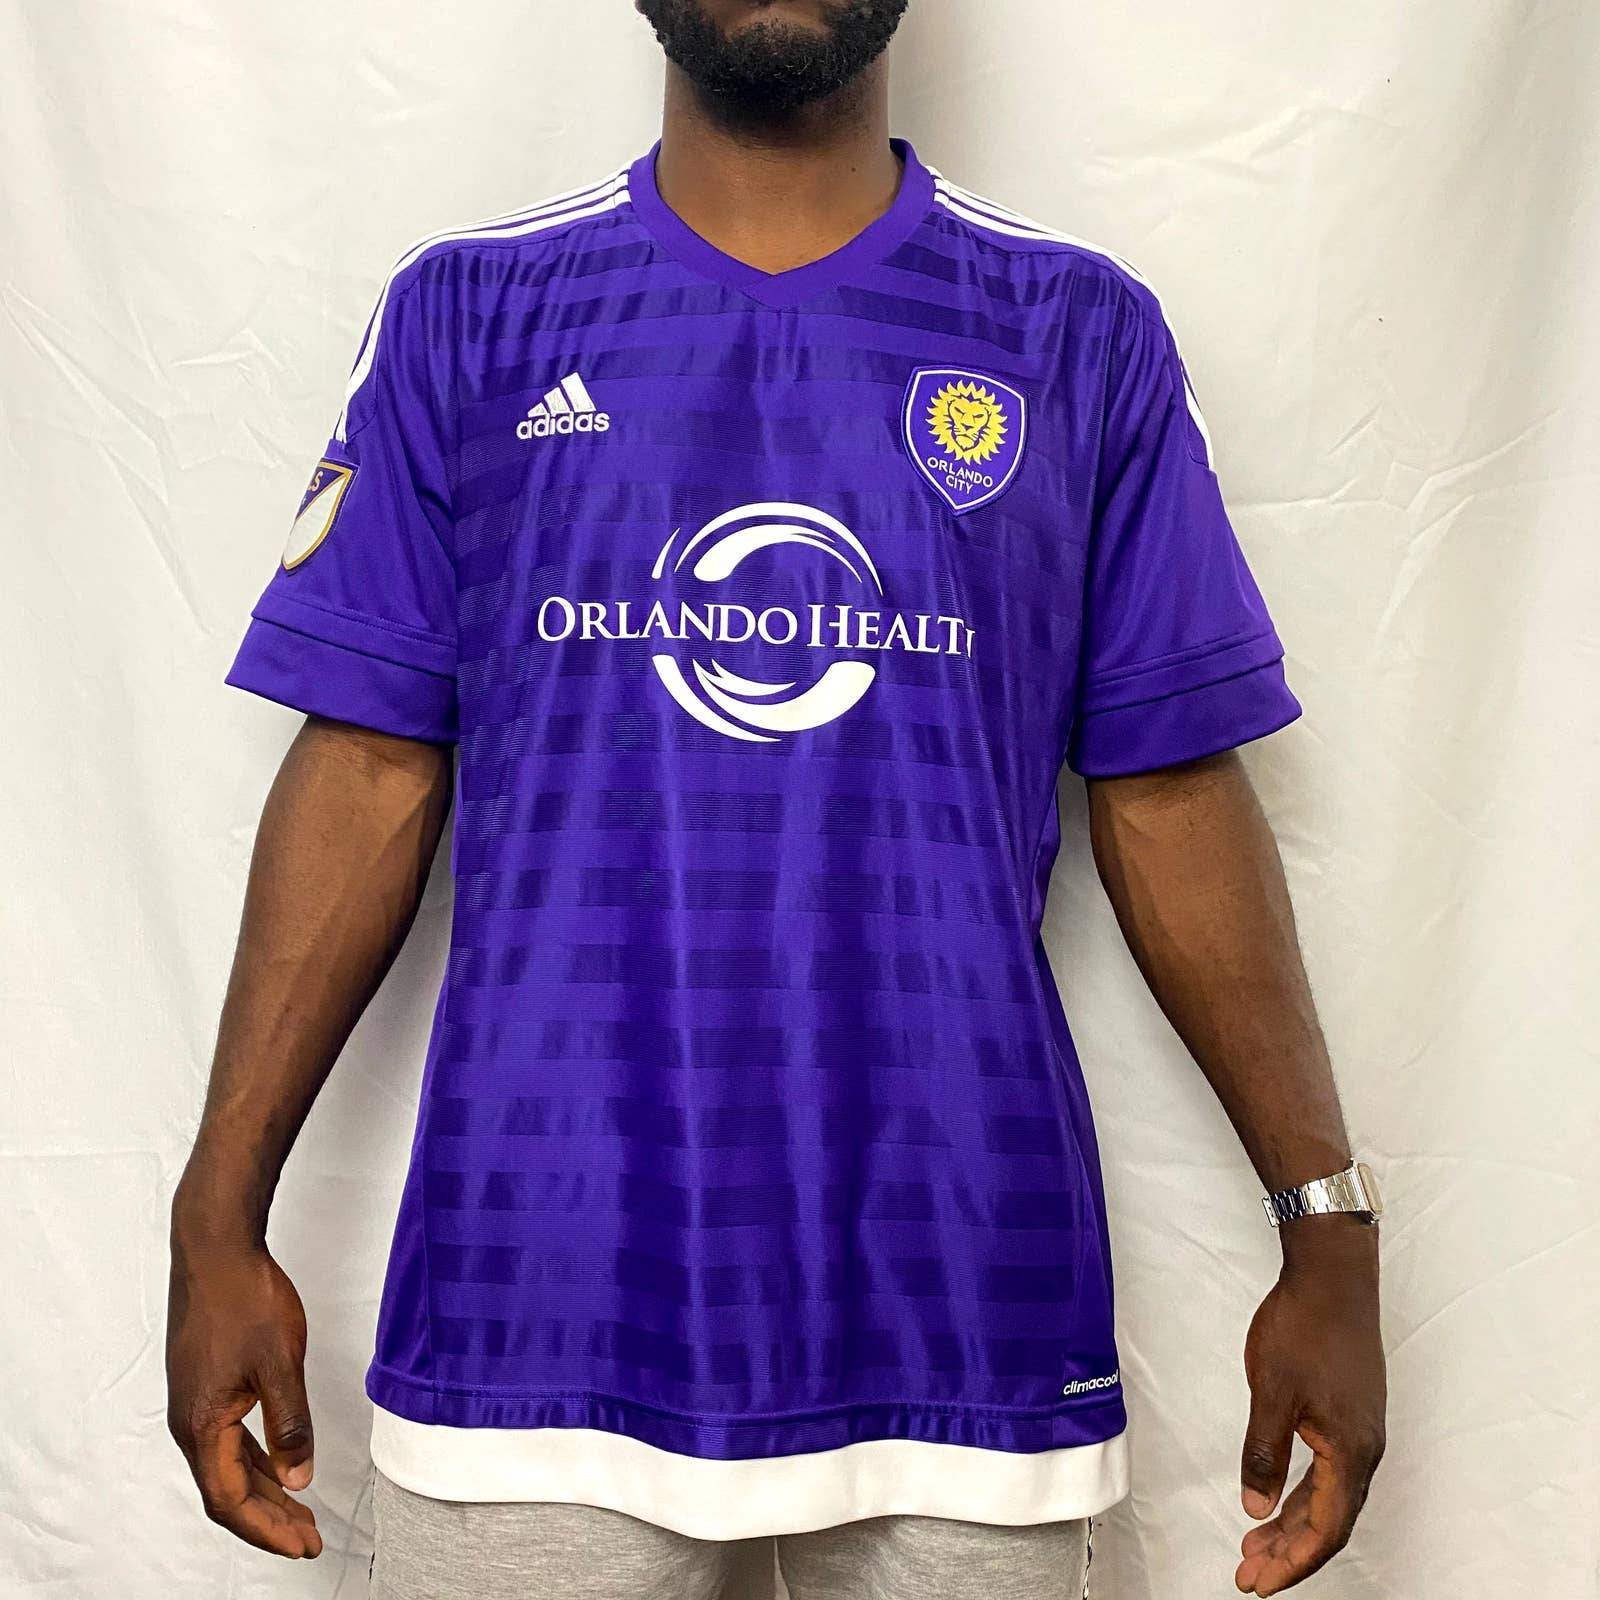 Adidas NWT adidas Orlando City Soccer Jersey xl